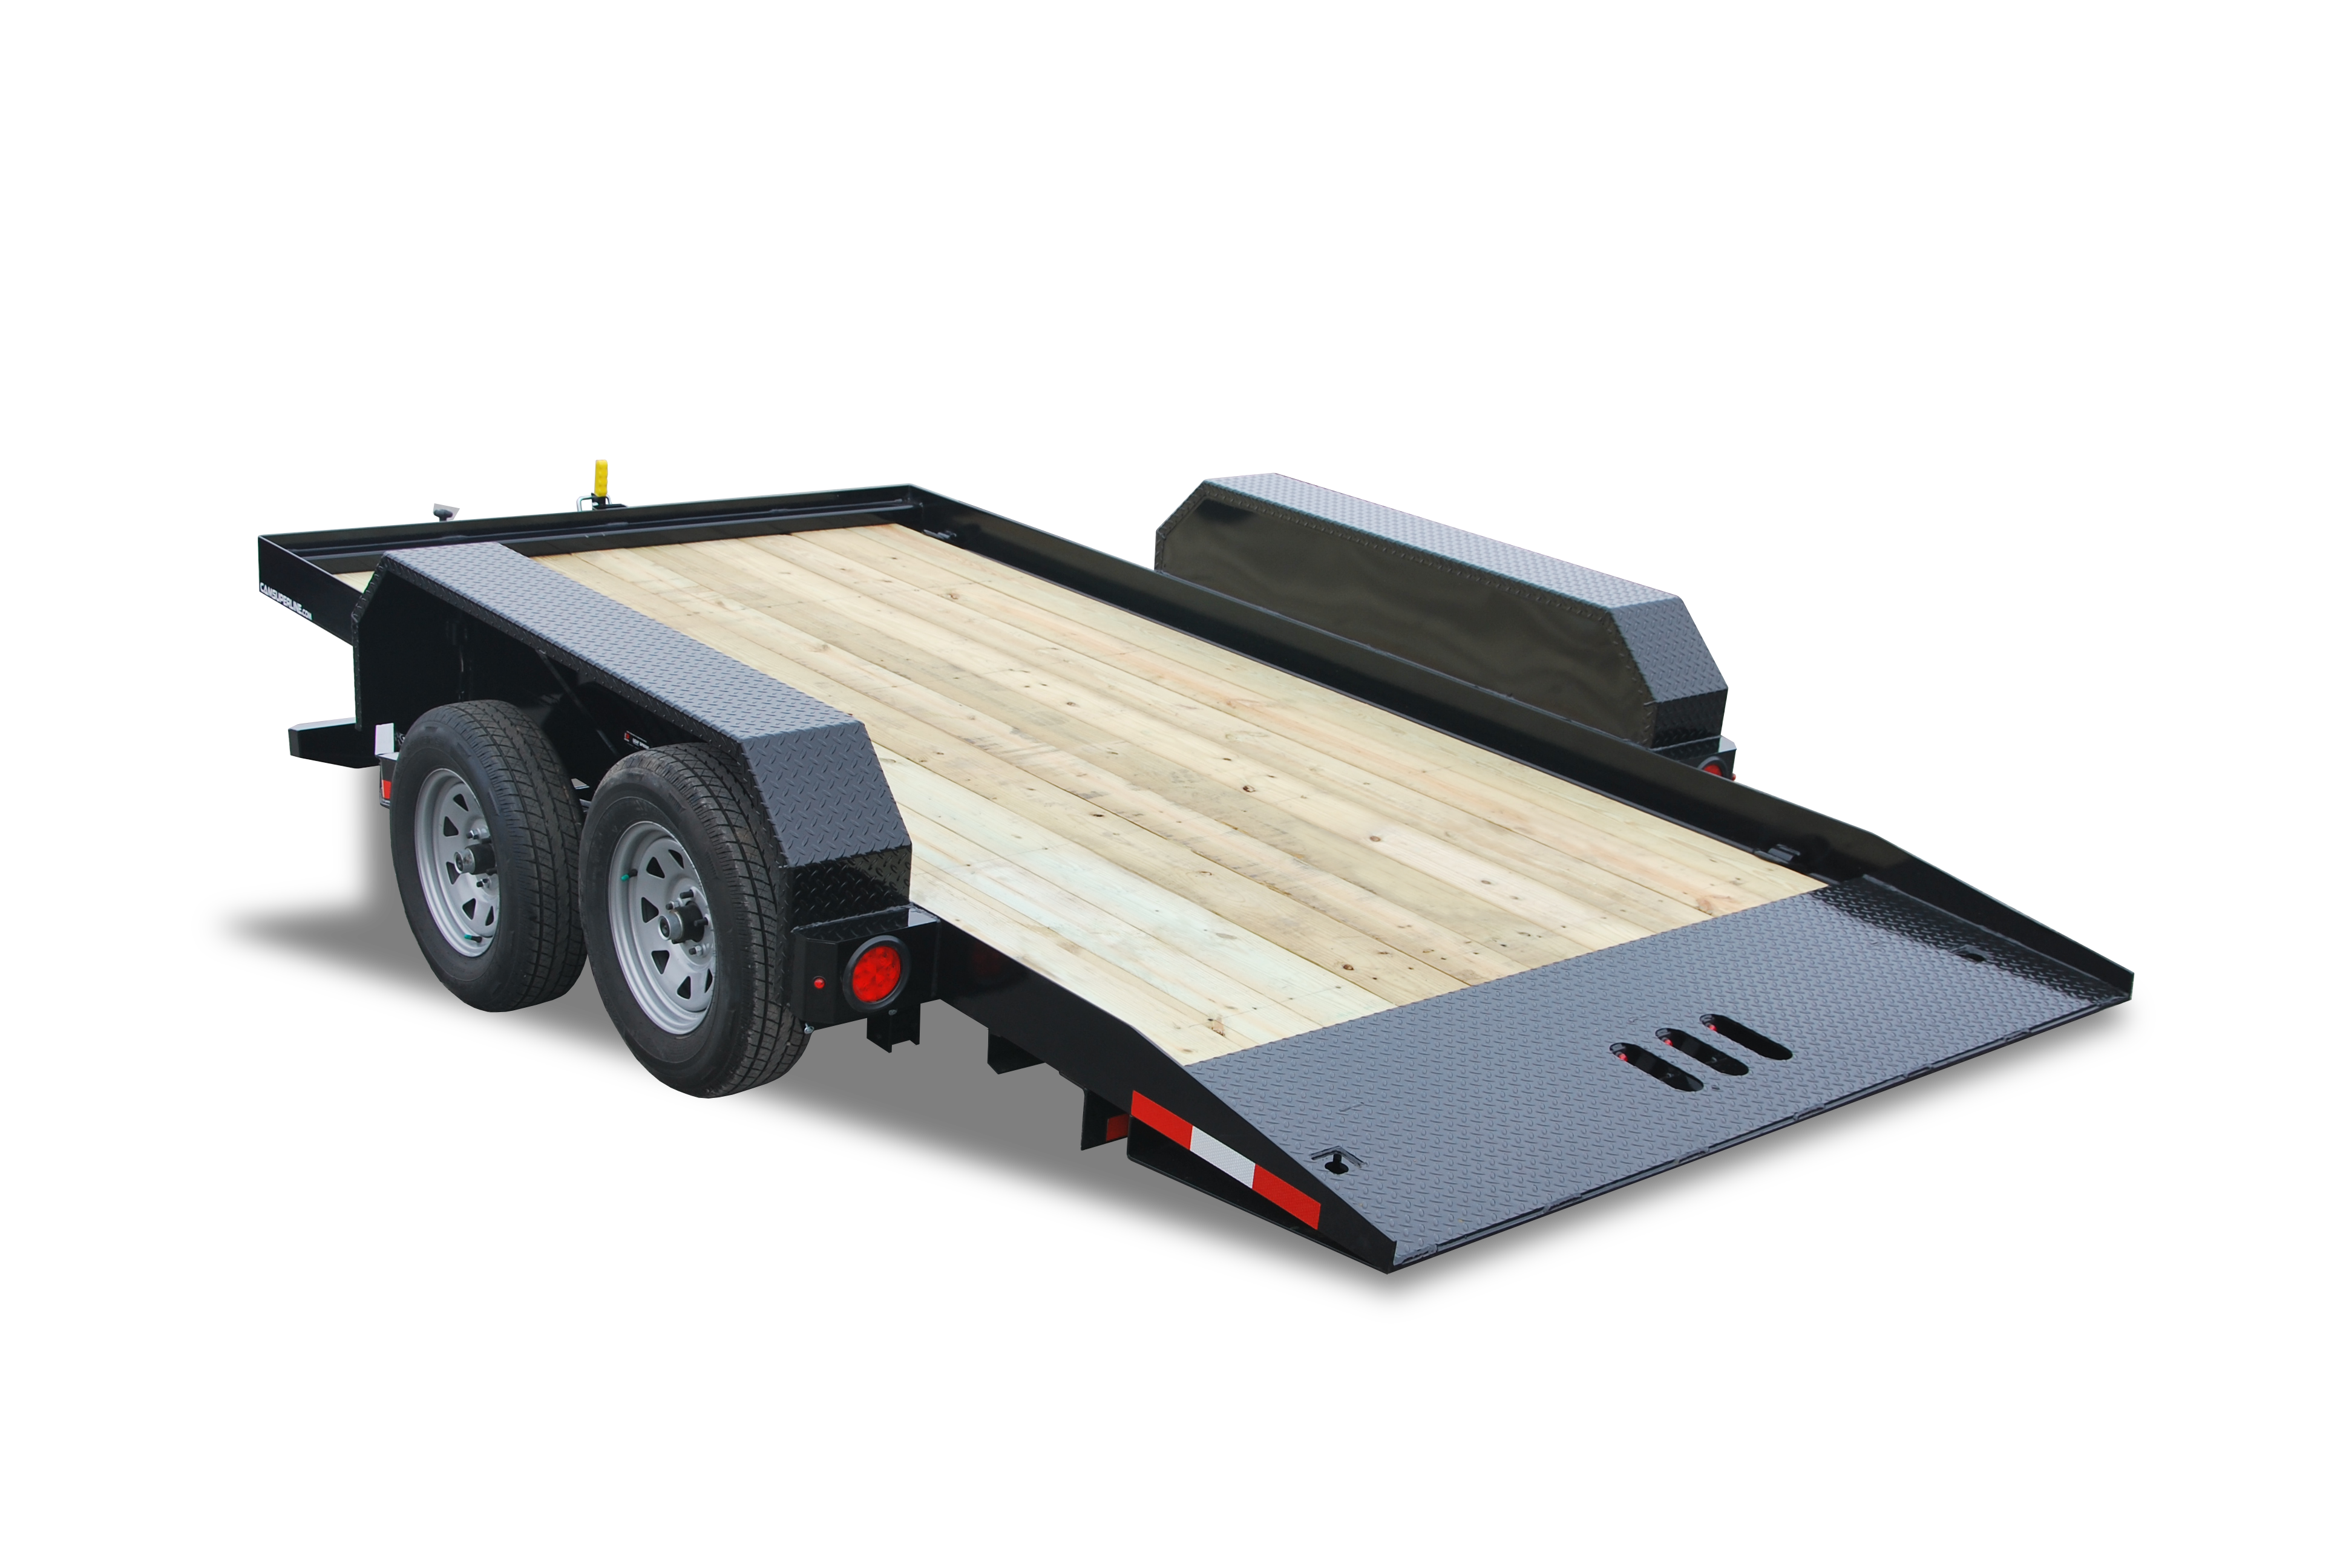 2021 Cam Superline 5 Ton 7x12 Tilt Trailer TA 102in WIDE